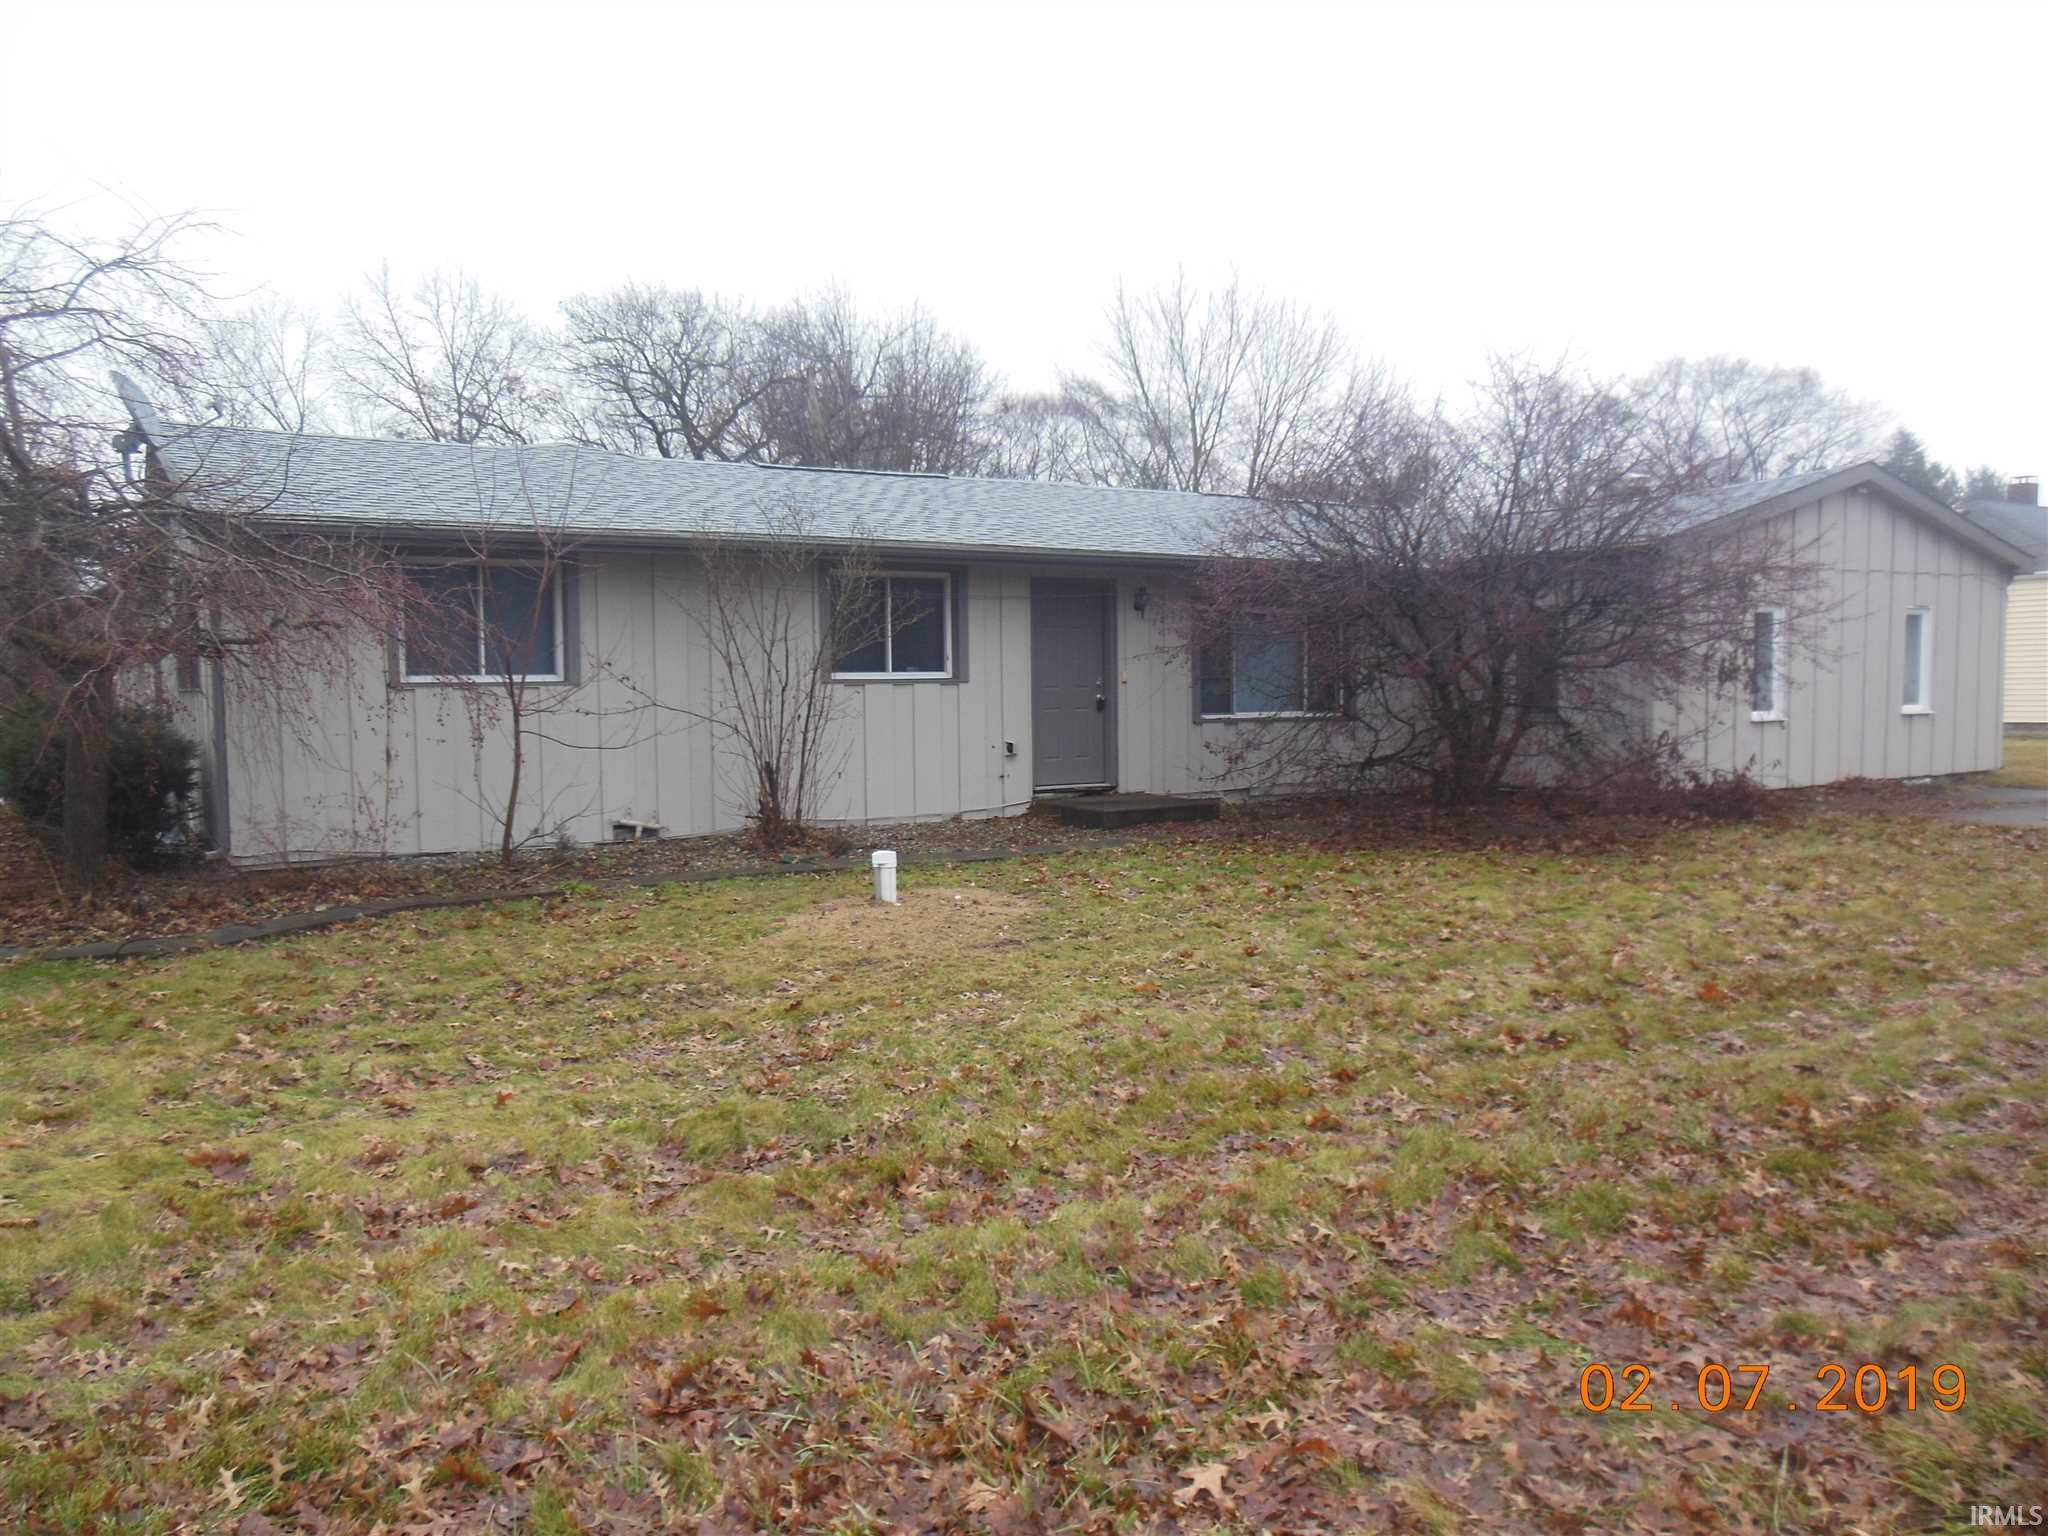 54554 County Road 1 Elkhart, IN 46514